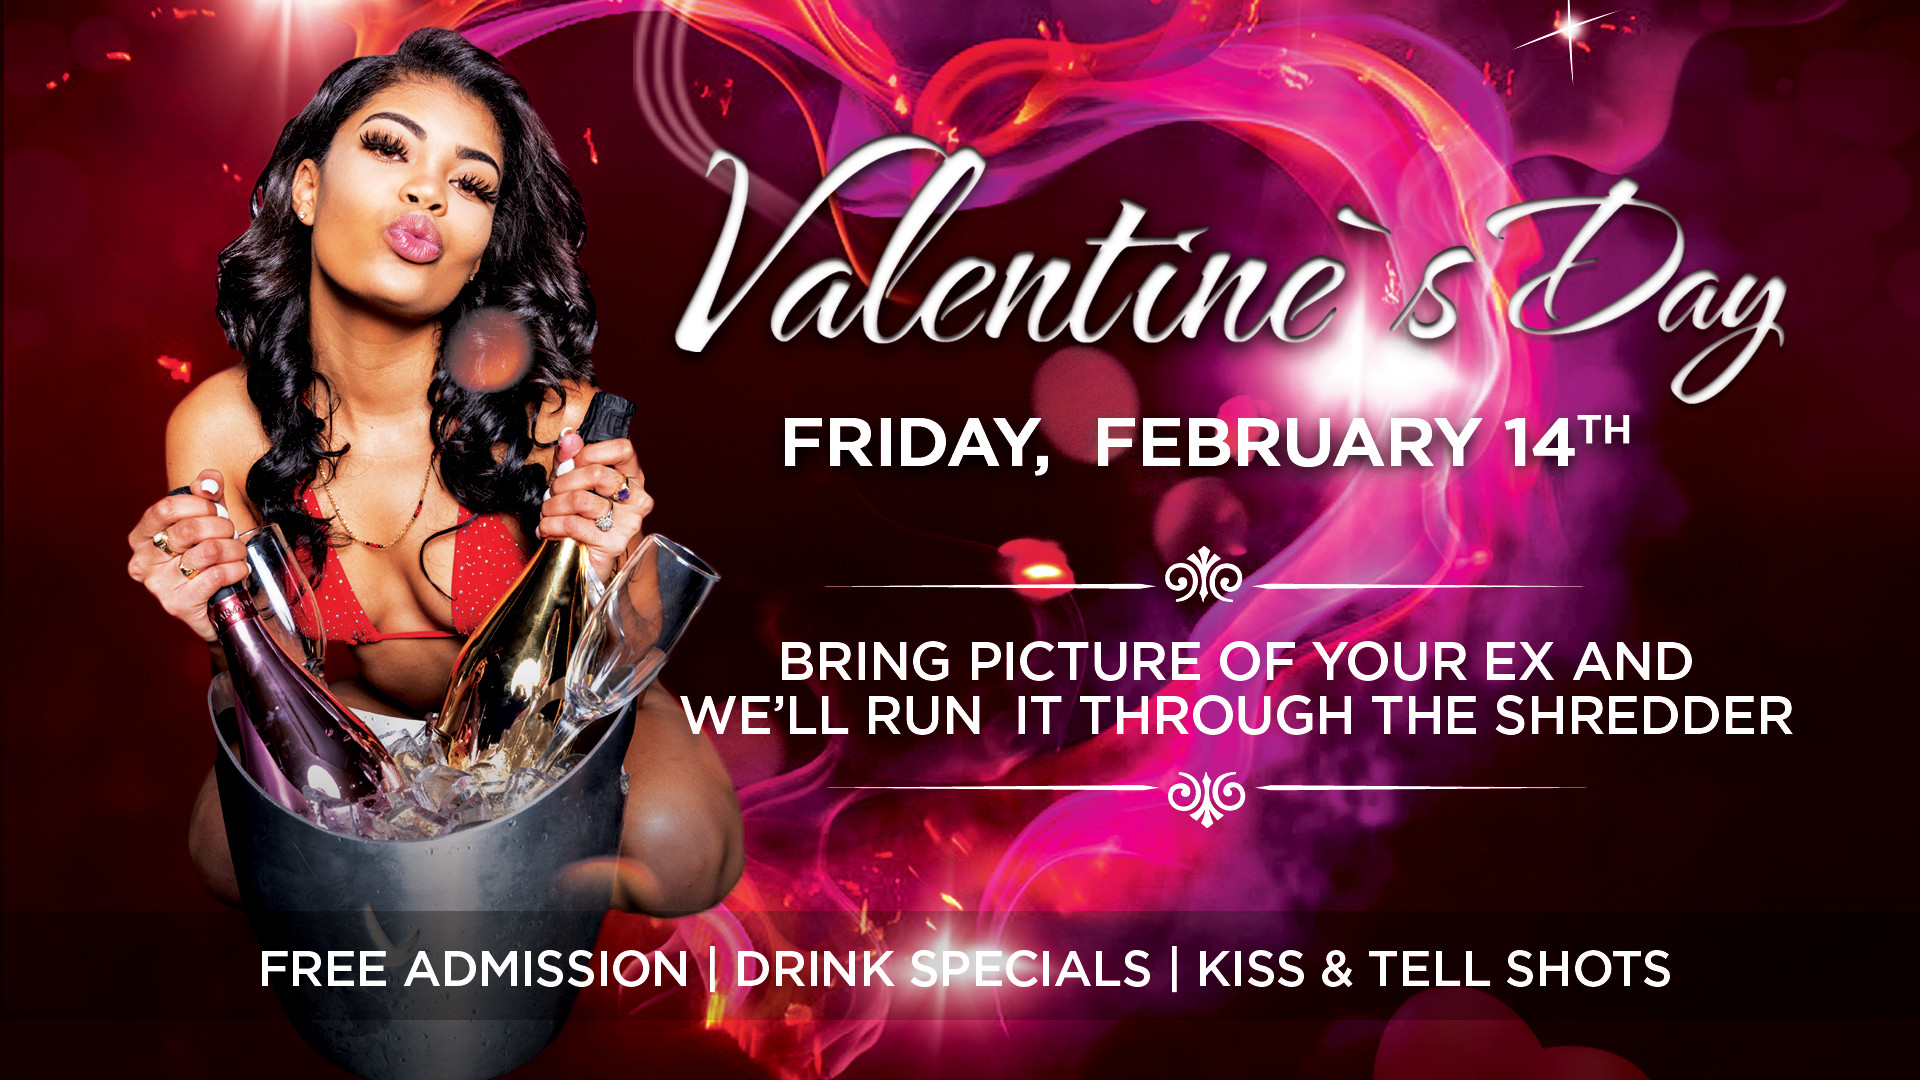 MYNX_Valentines_Day_Flyer_1920_1080.jpg